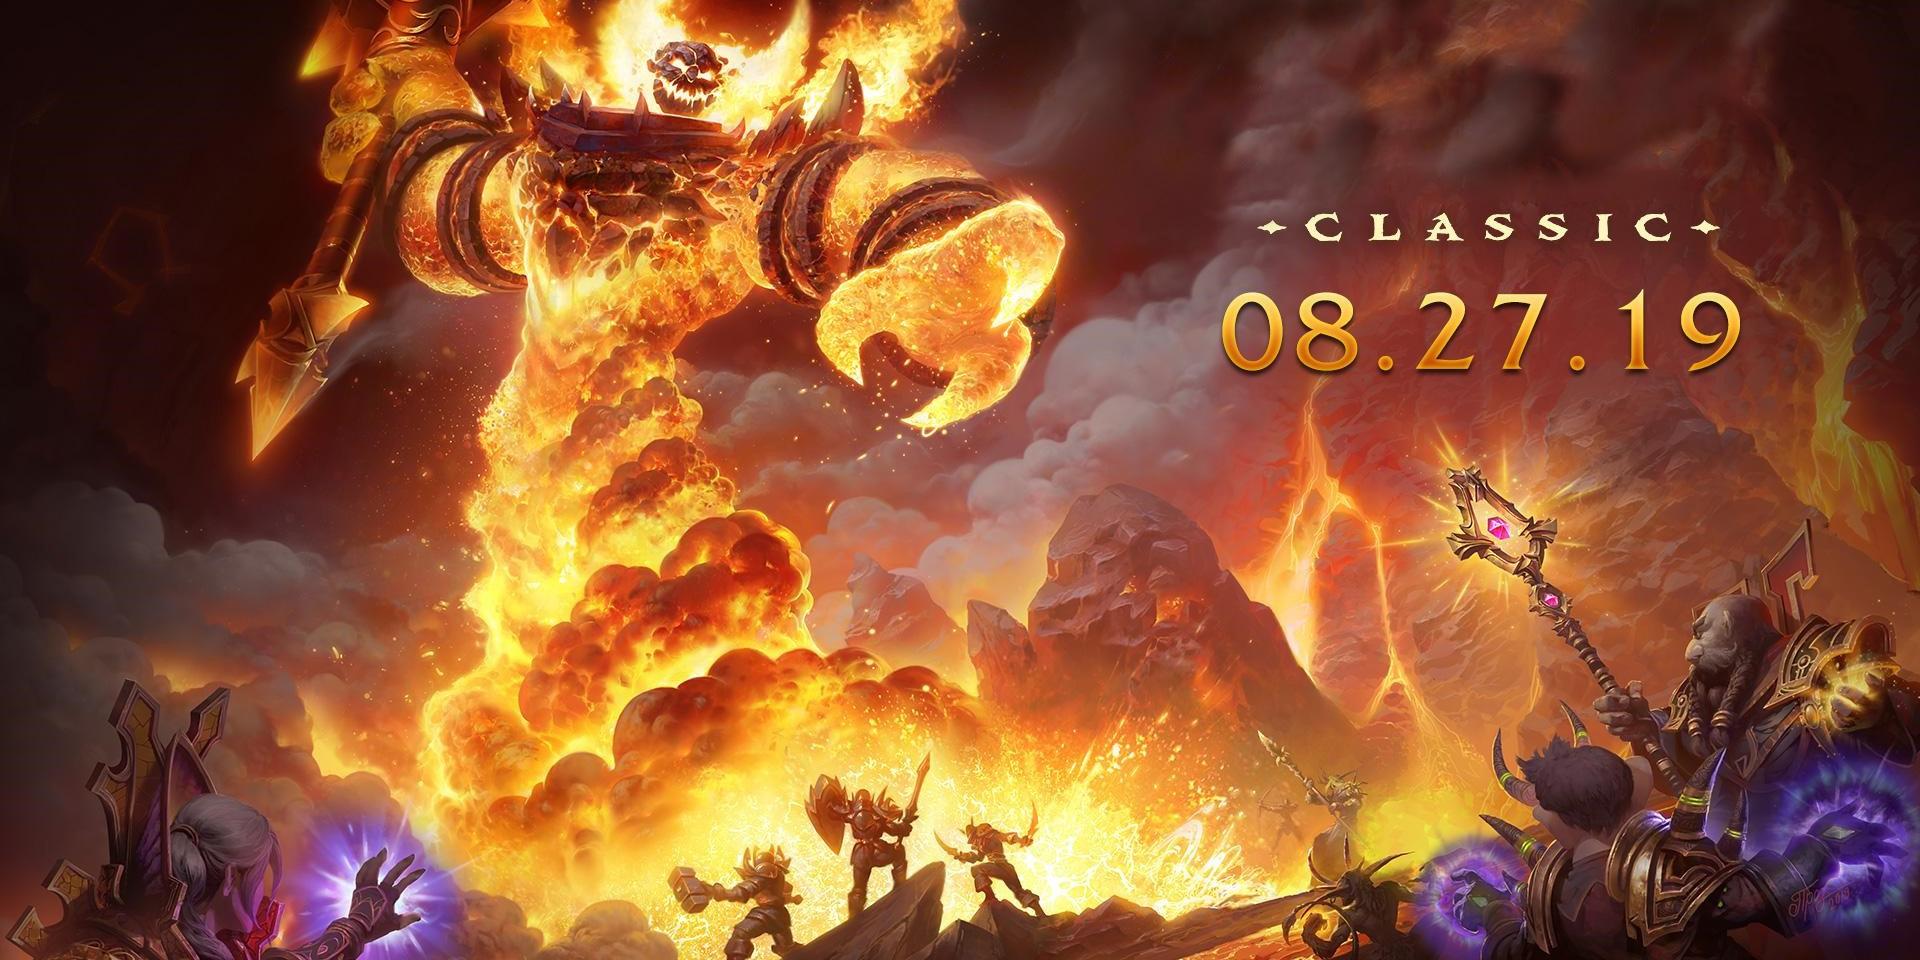 World of Warcraft: Классическая версия стартует 27 августа, а в Blizzard раздумывают о развитии классики до Wrath of the Lich King